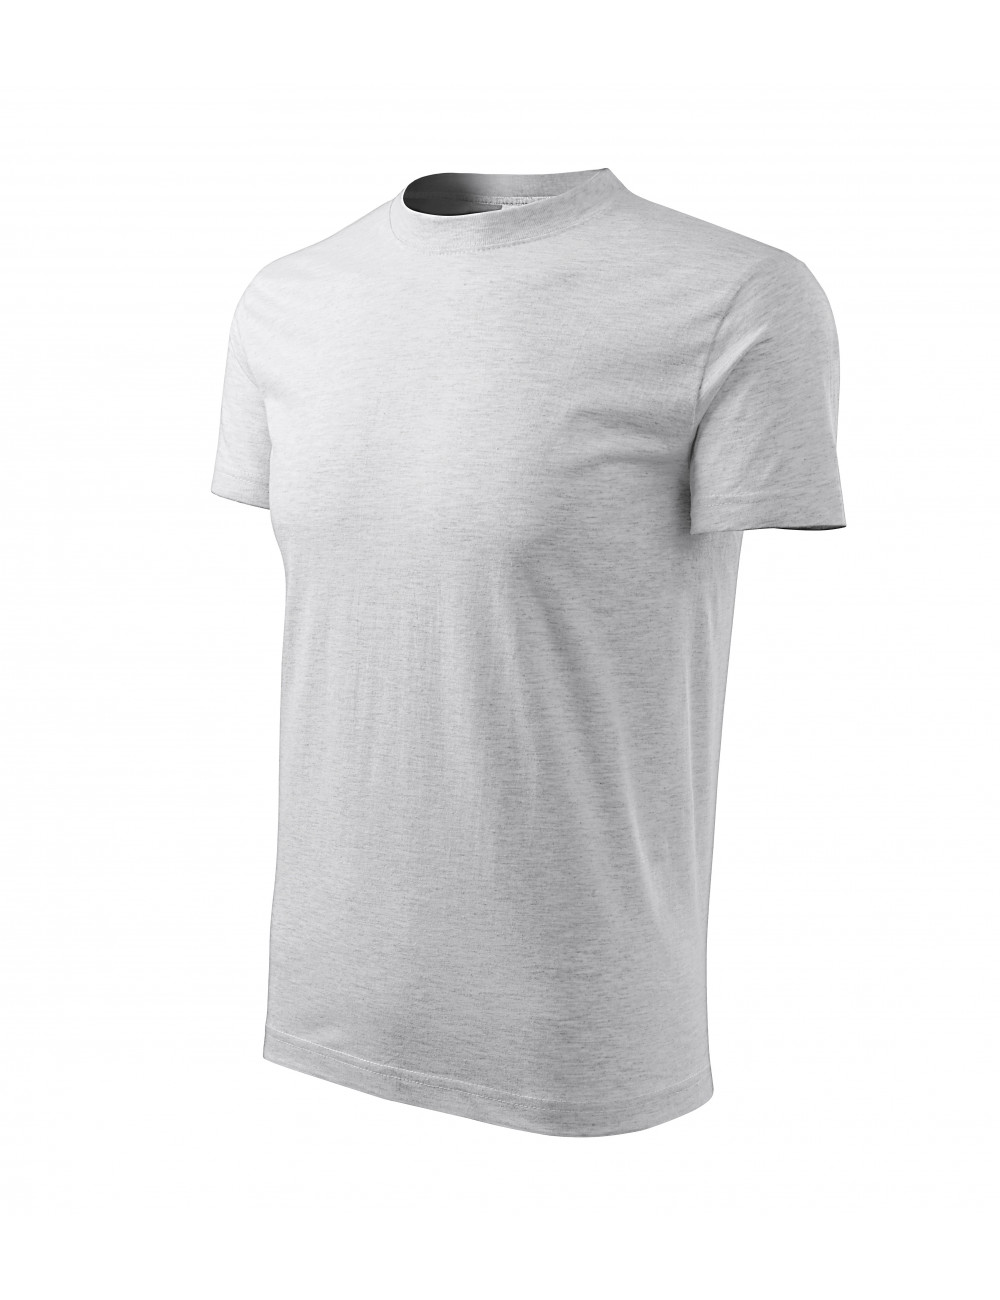 Adler MALFINI Koszulka unisex Classic 101 jasnoszary melanż